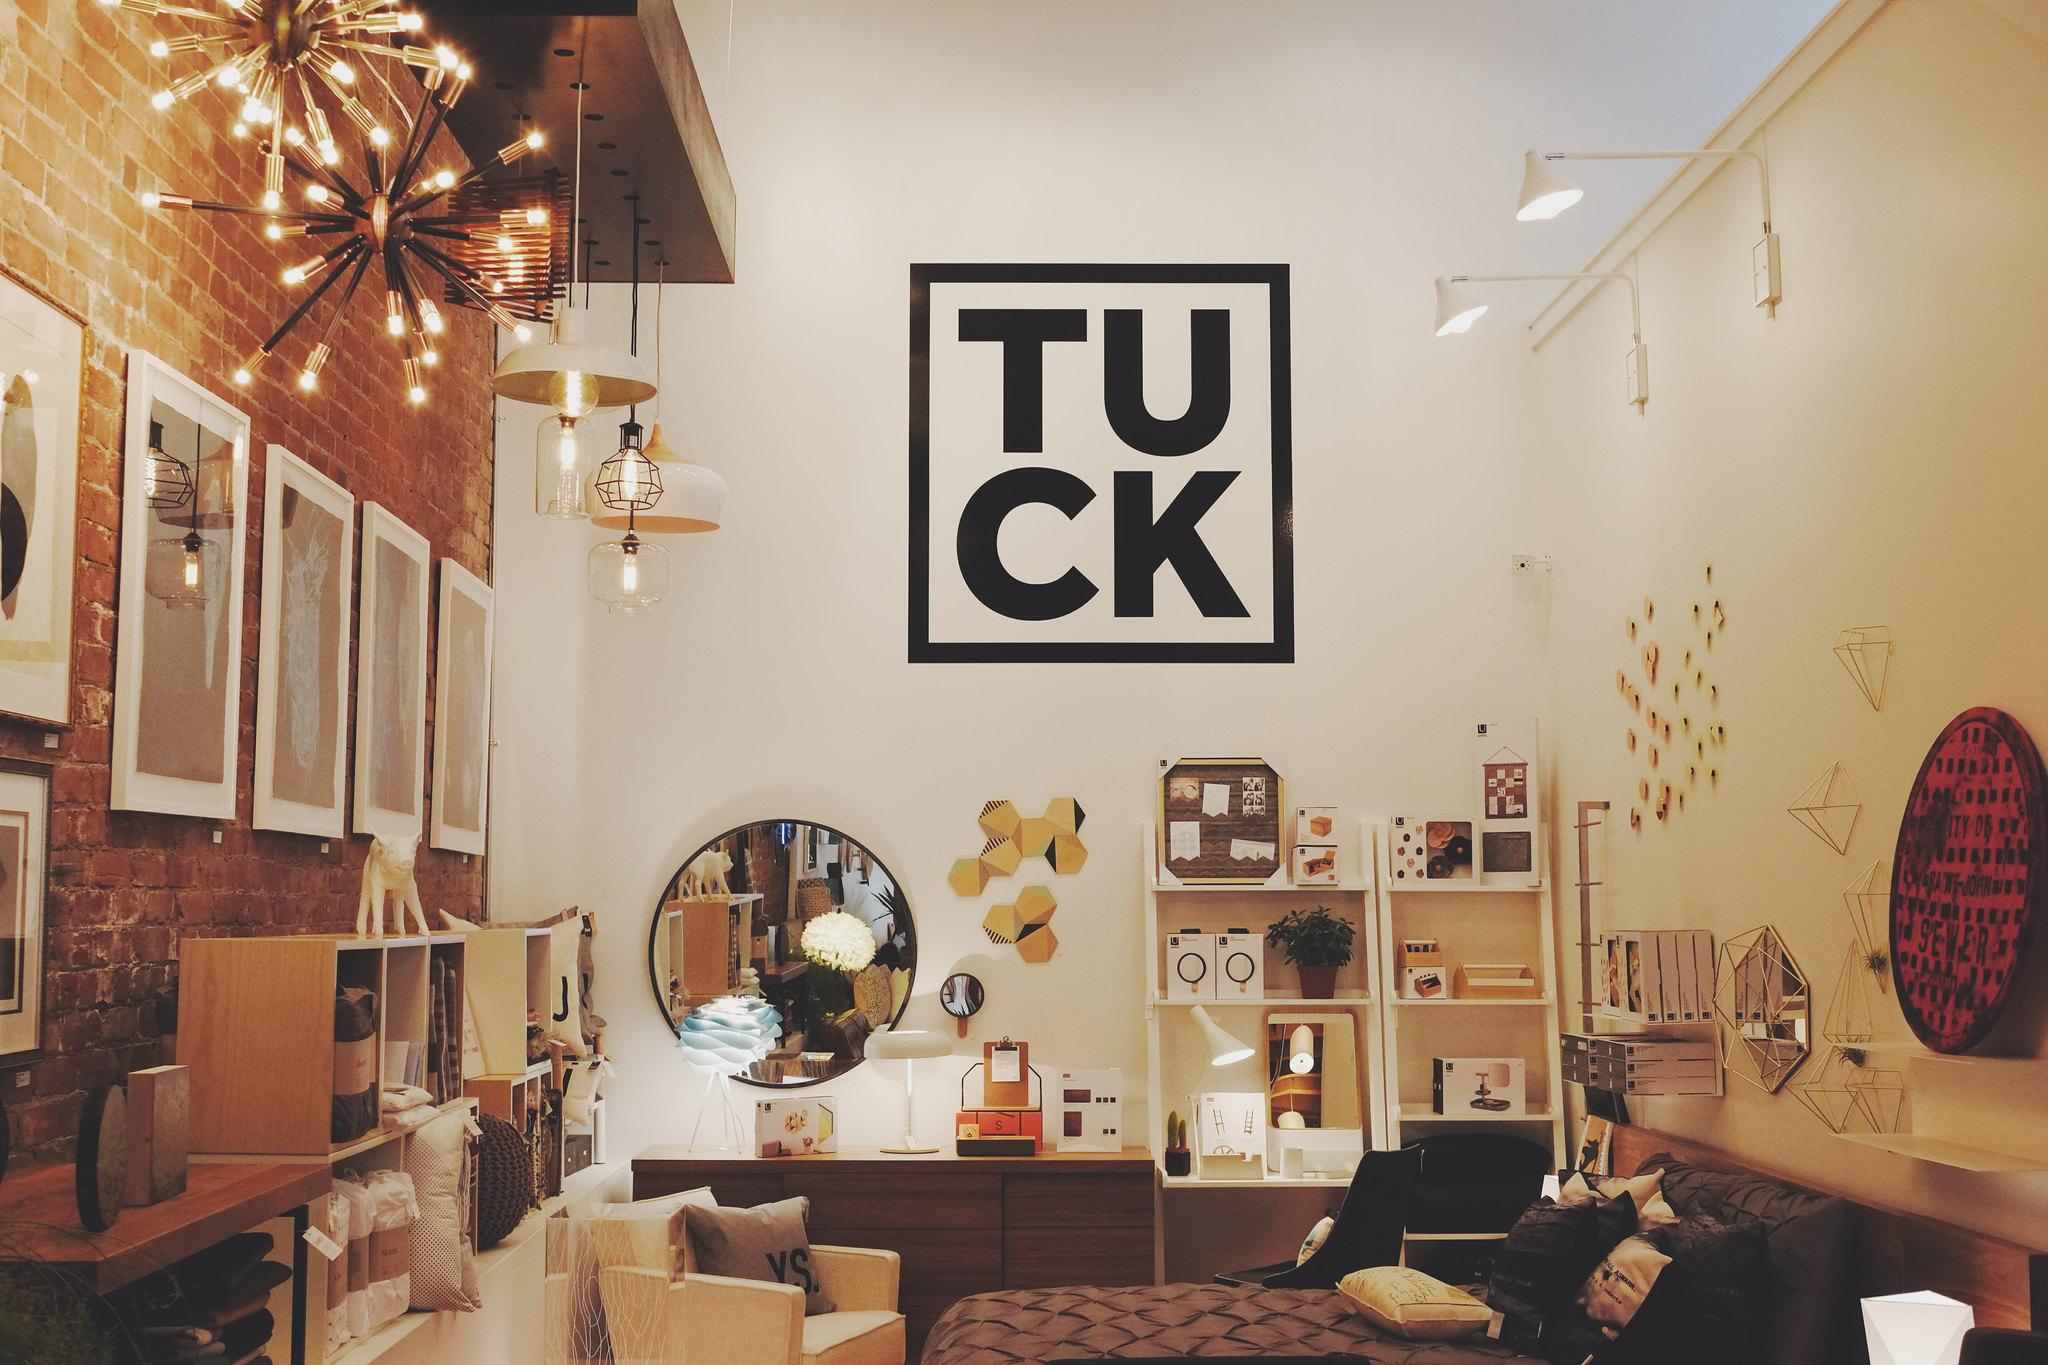 TUCK Studio